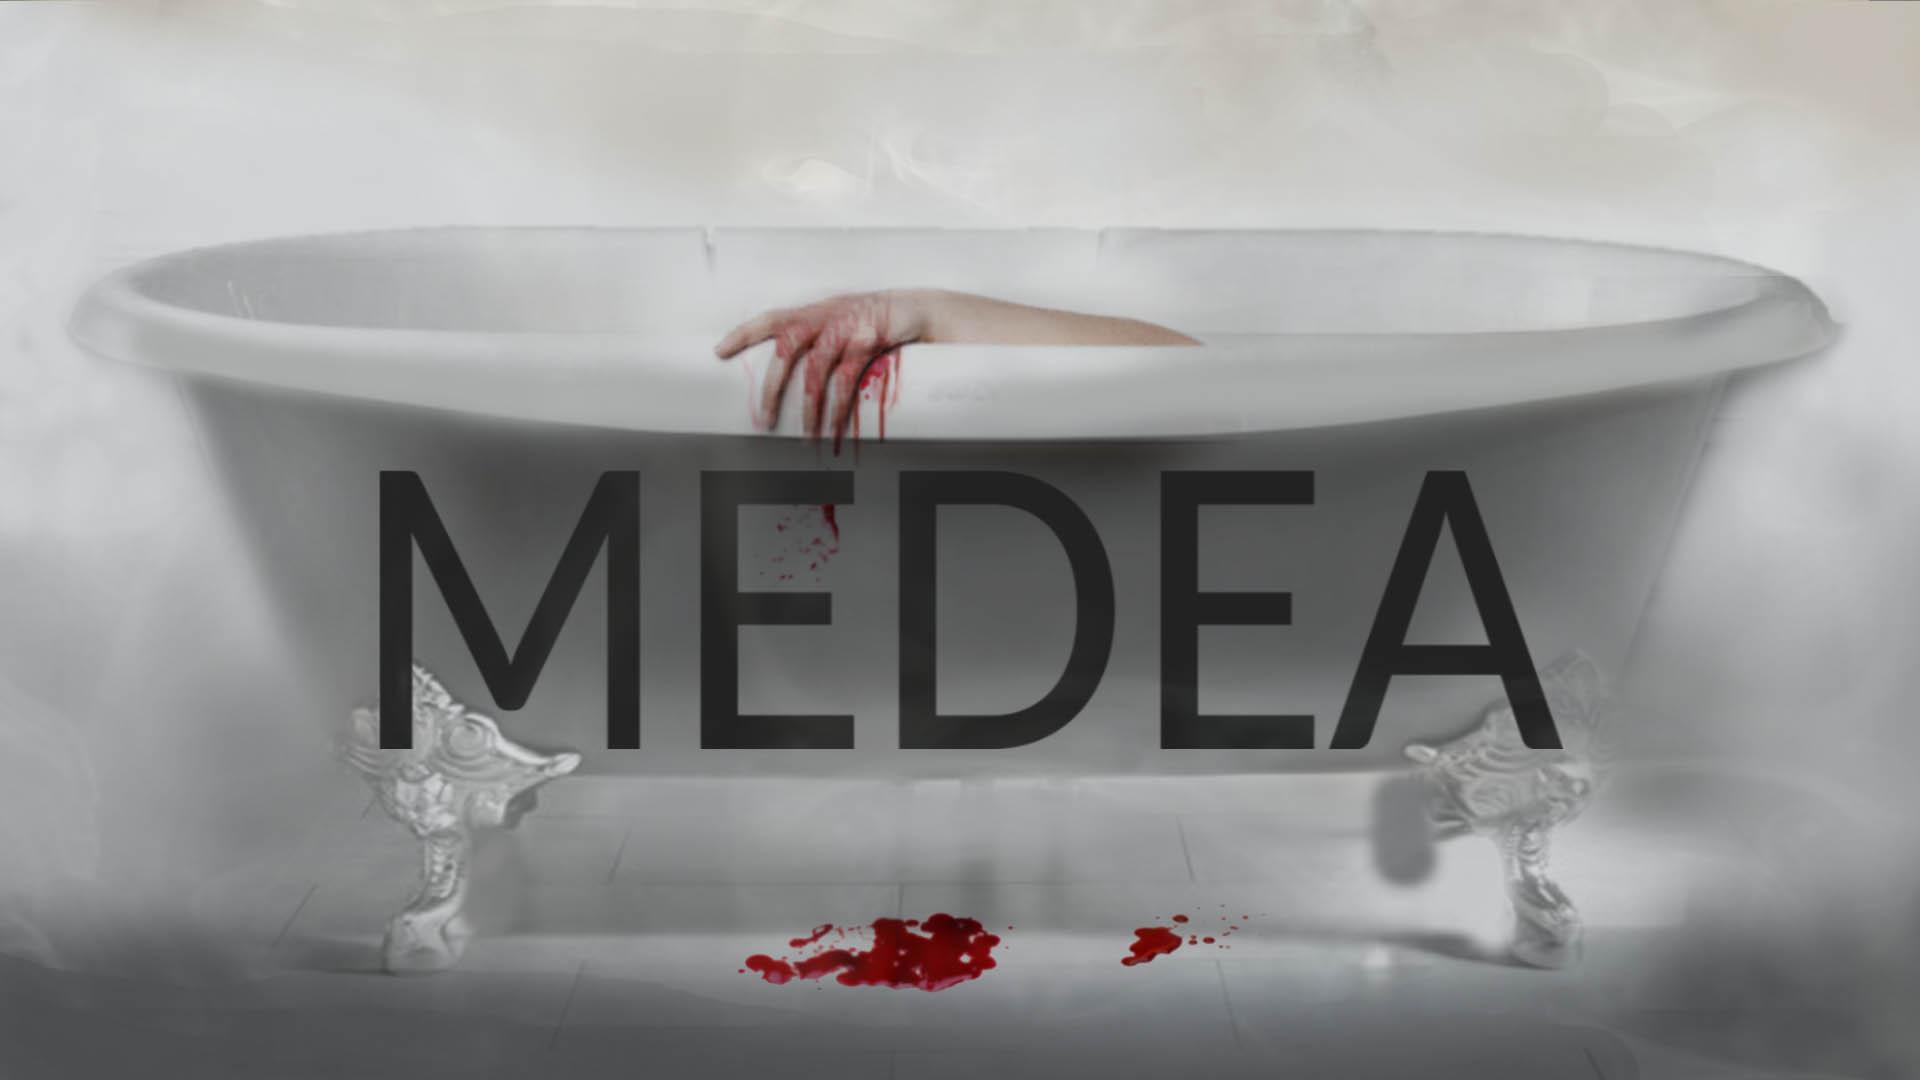 Medea-poster-katherine-mcclinitc-choreography.jpg